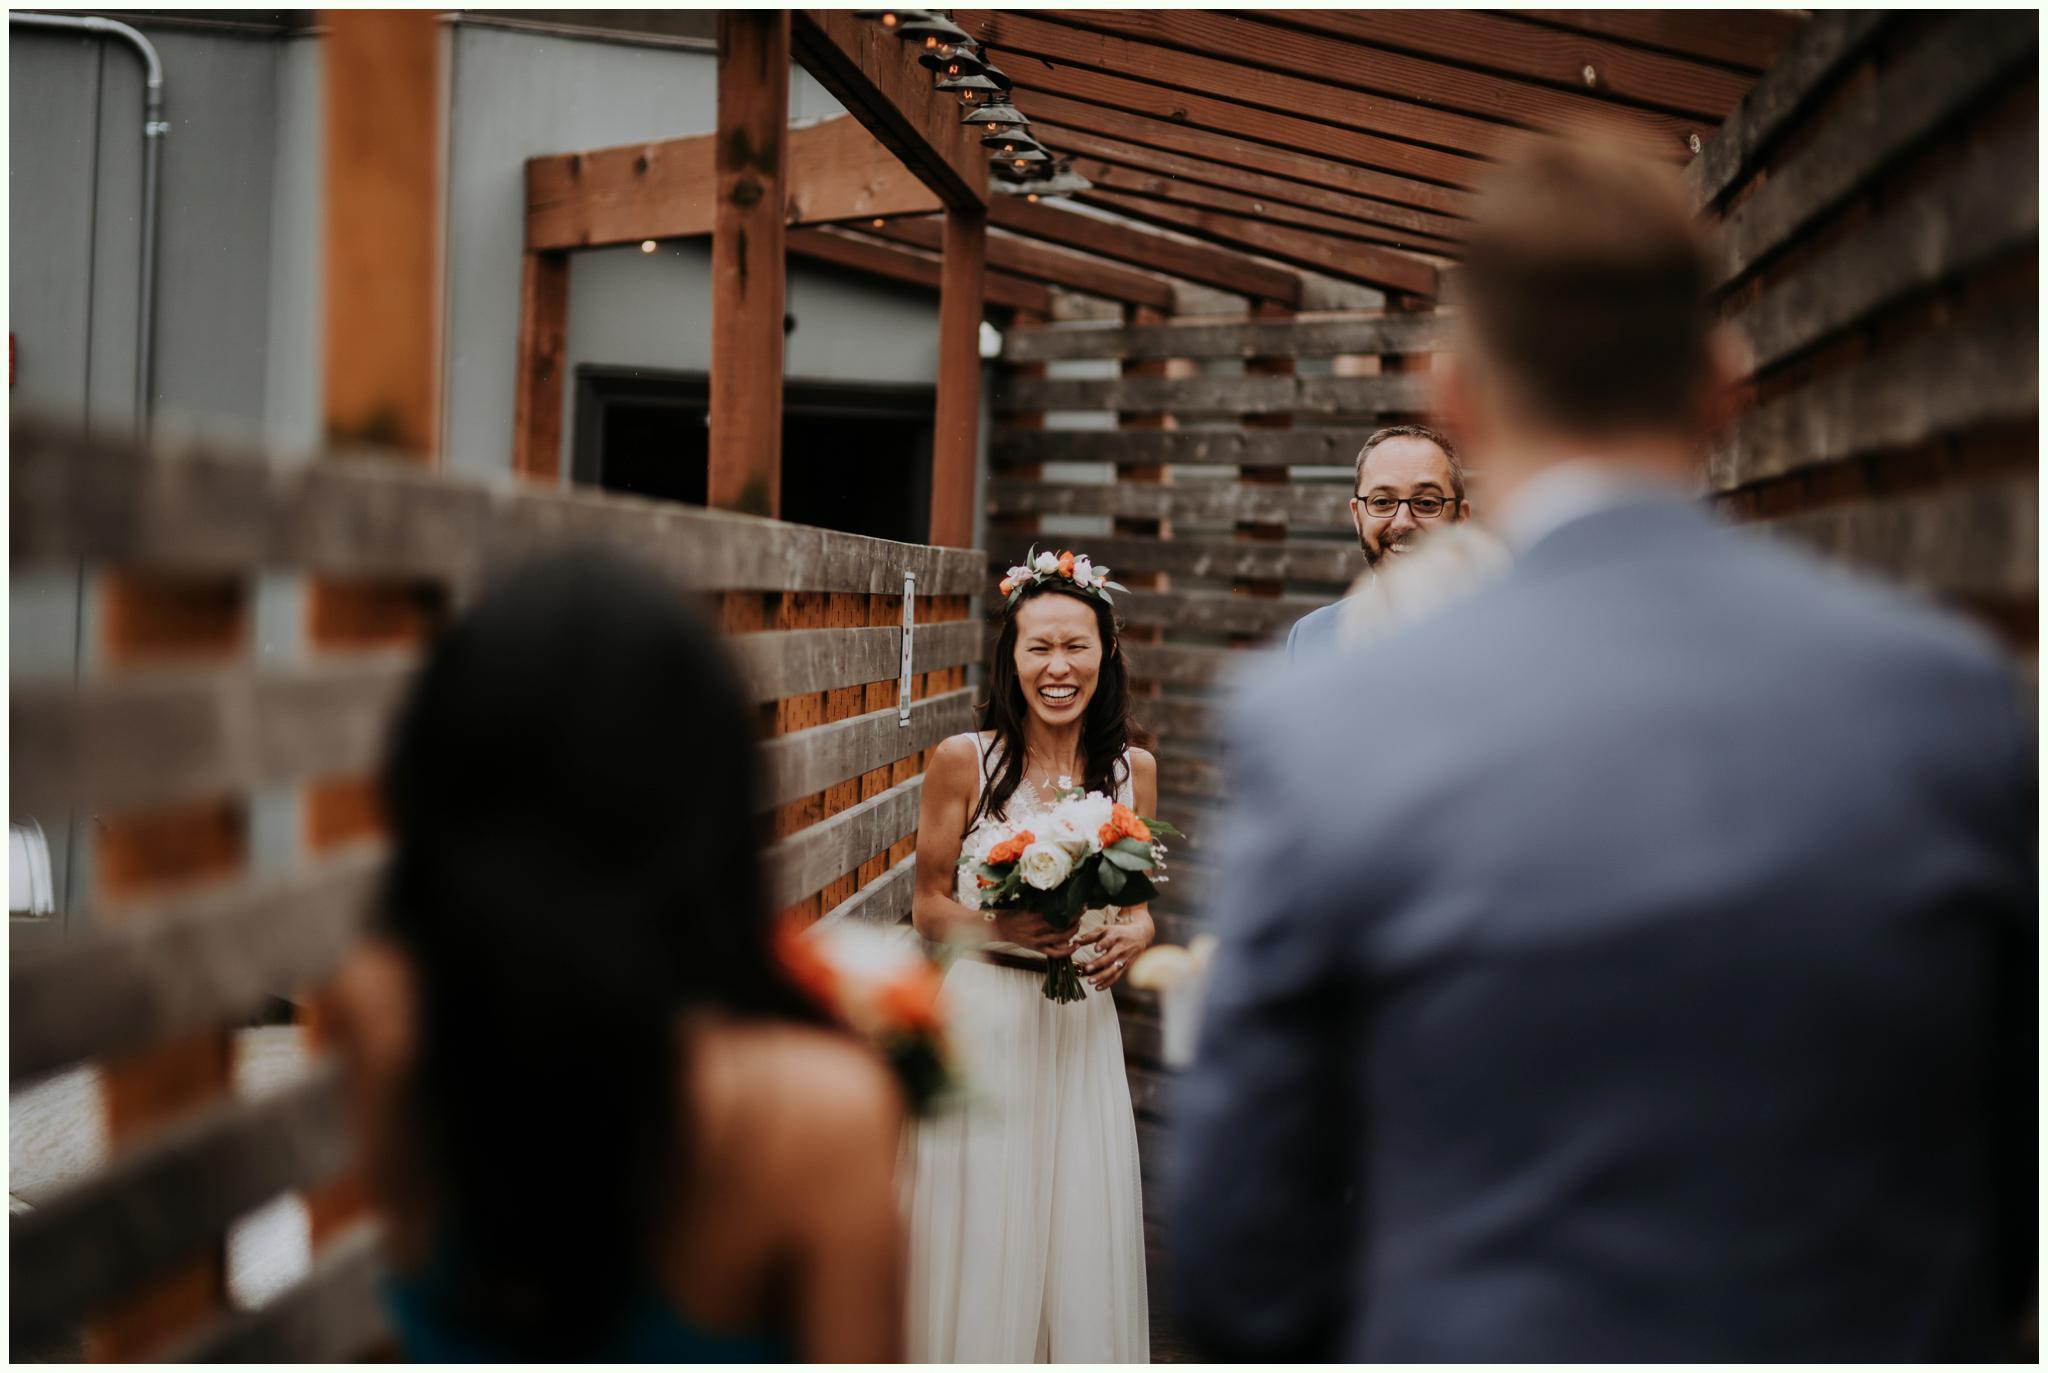 within-sodo-june-wedding-seattle-photographer-caitlyn-nikula-66.jpg